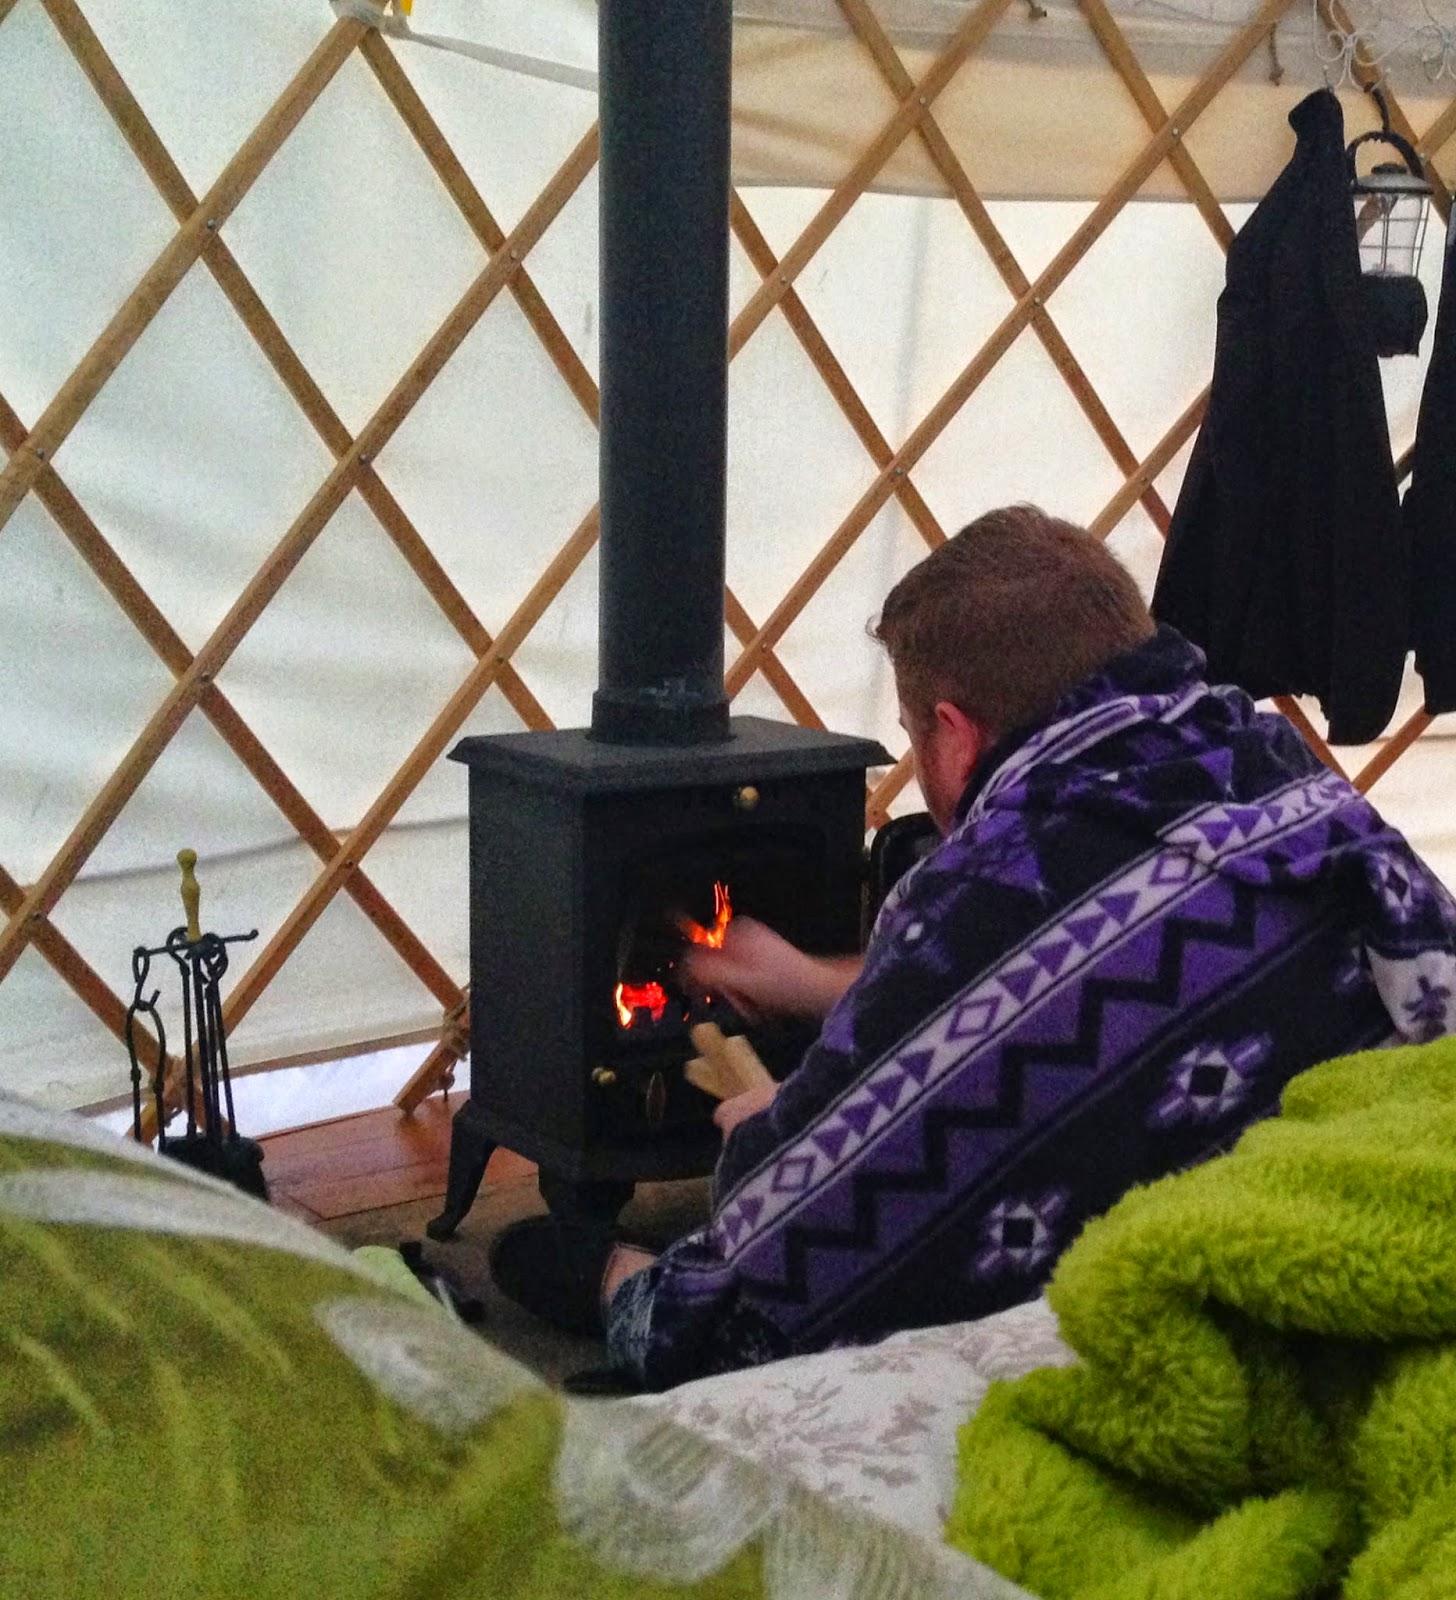 Acorn Glade - lighting the wood burning stove in yurt